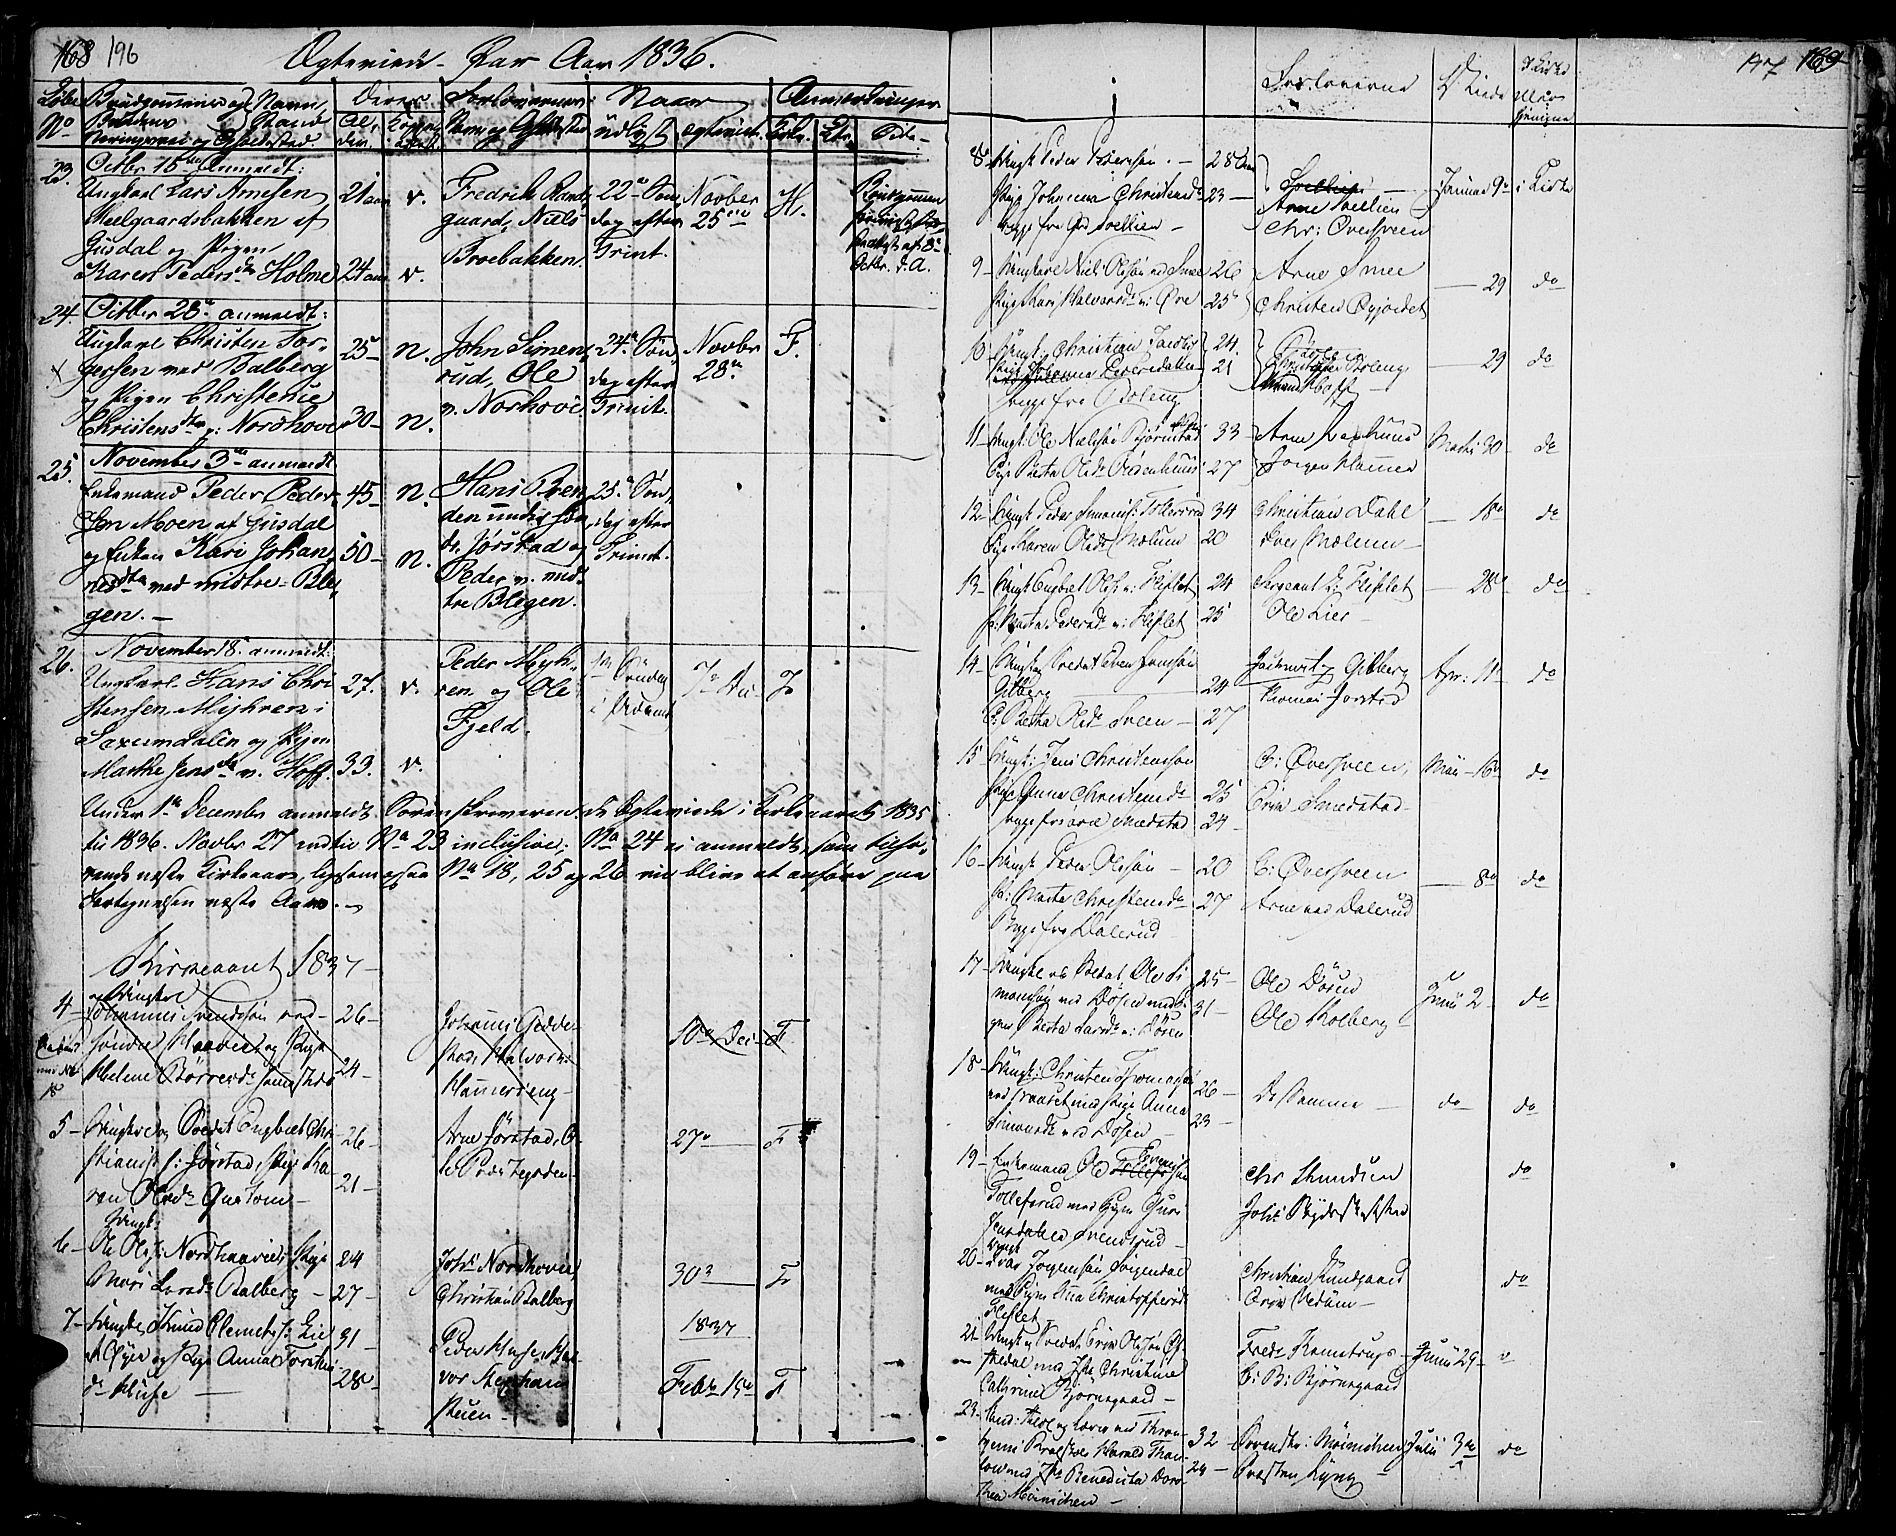 SAH, Fåberg prestekontor, Ministerialbok nr. 4, 1833-1837, s. 196-197